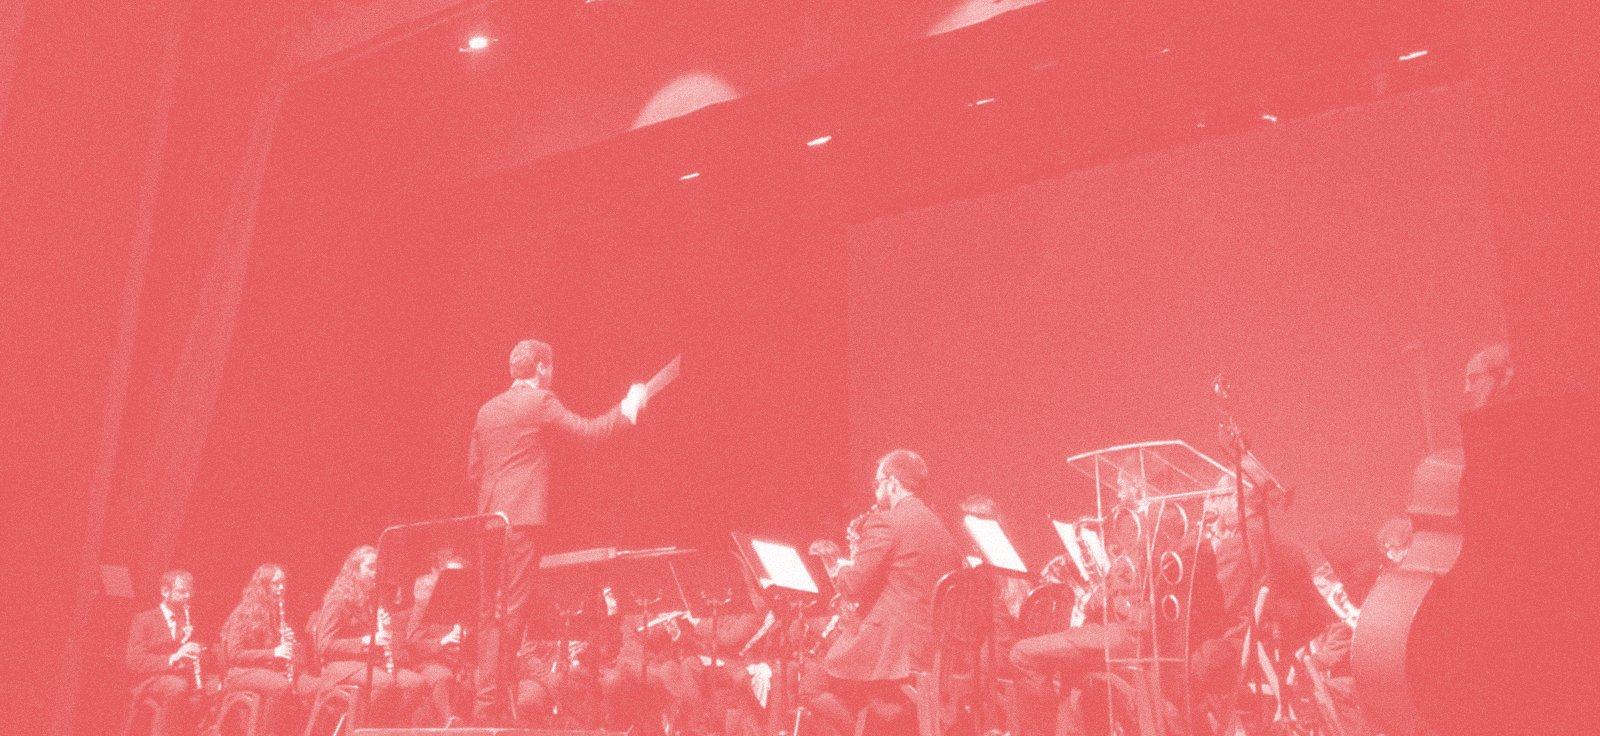 Concierto Festa de la Música con la Banda Simfònica de l'AAM Oliva